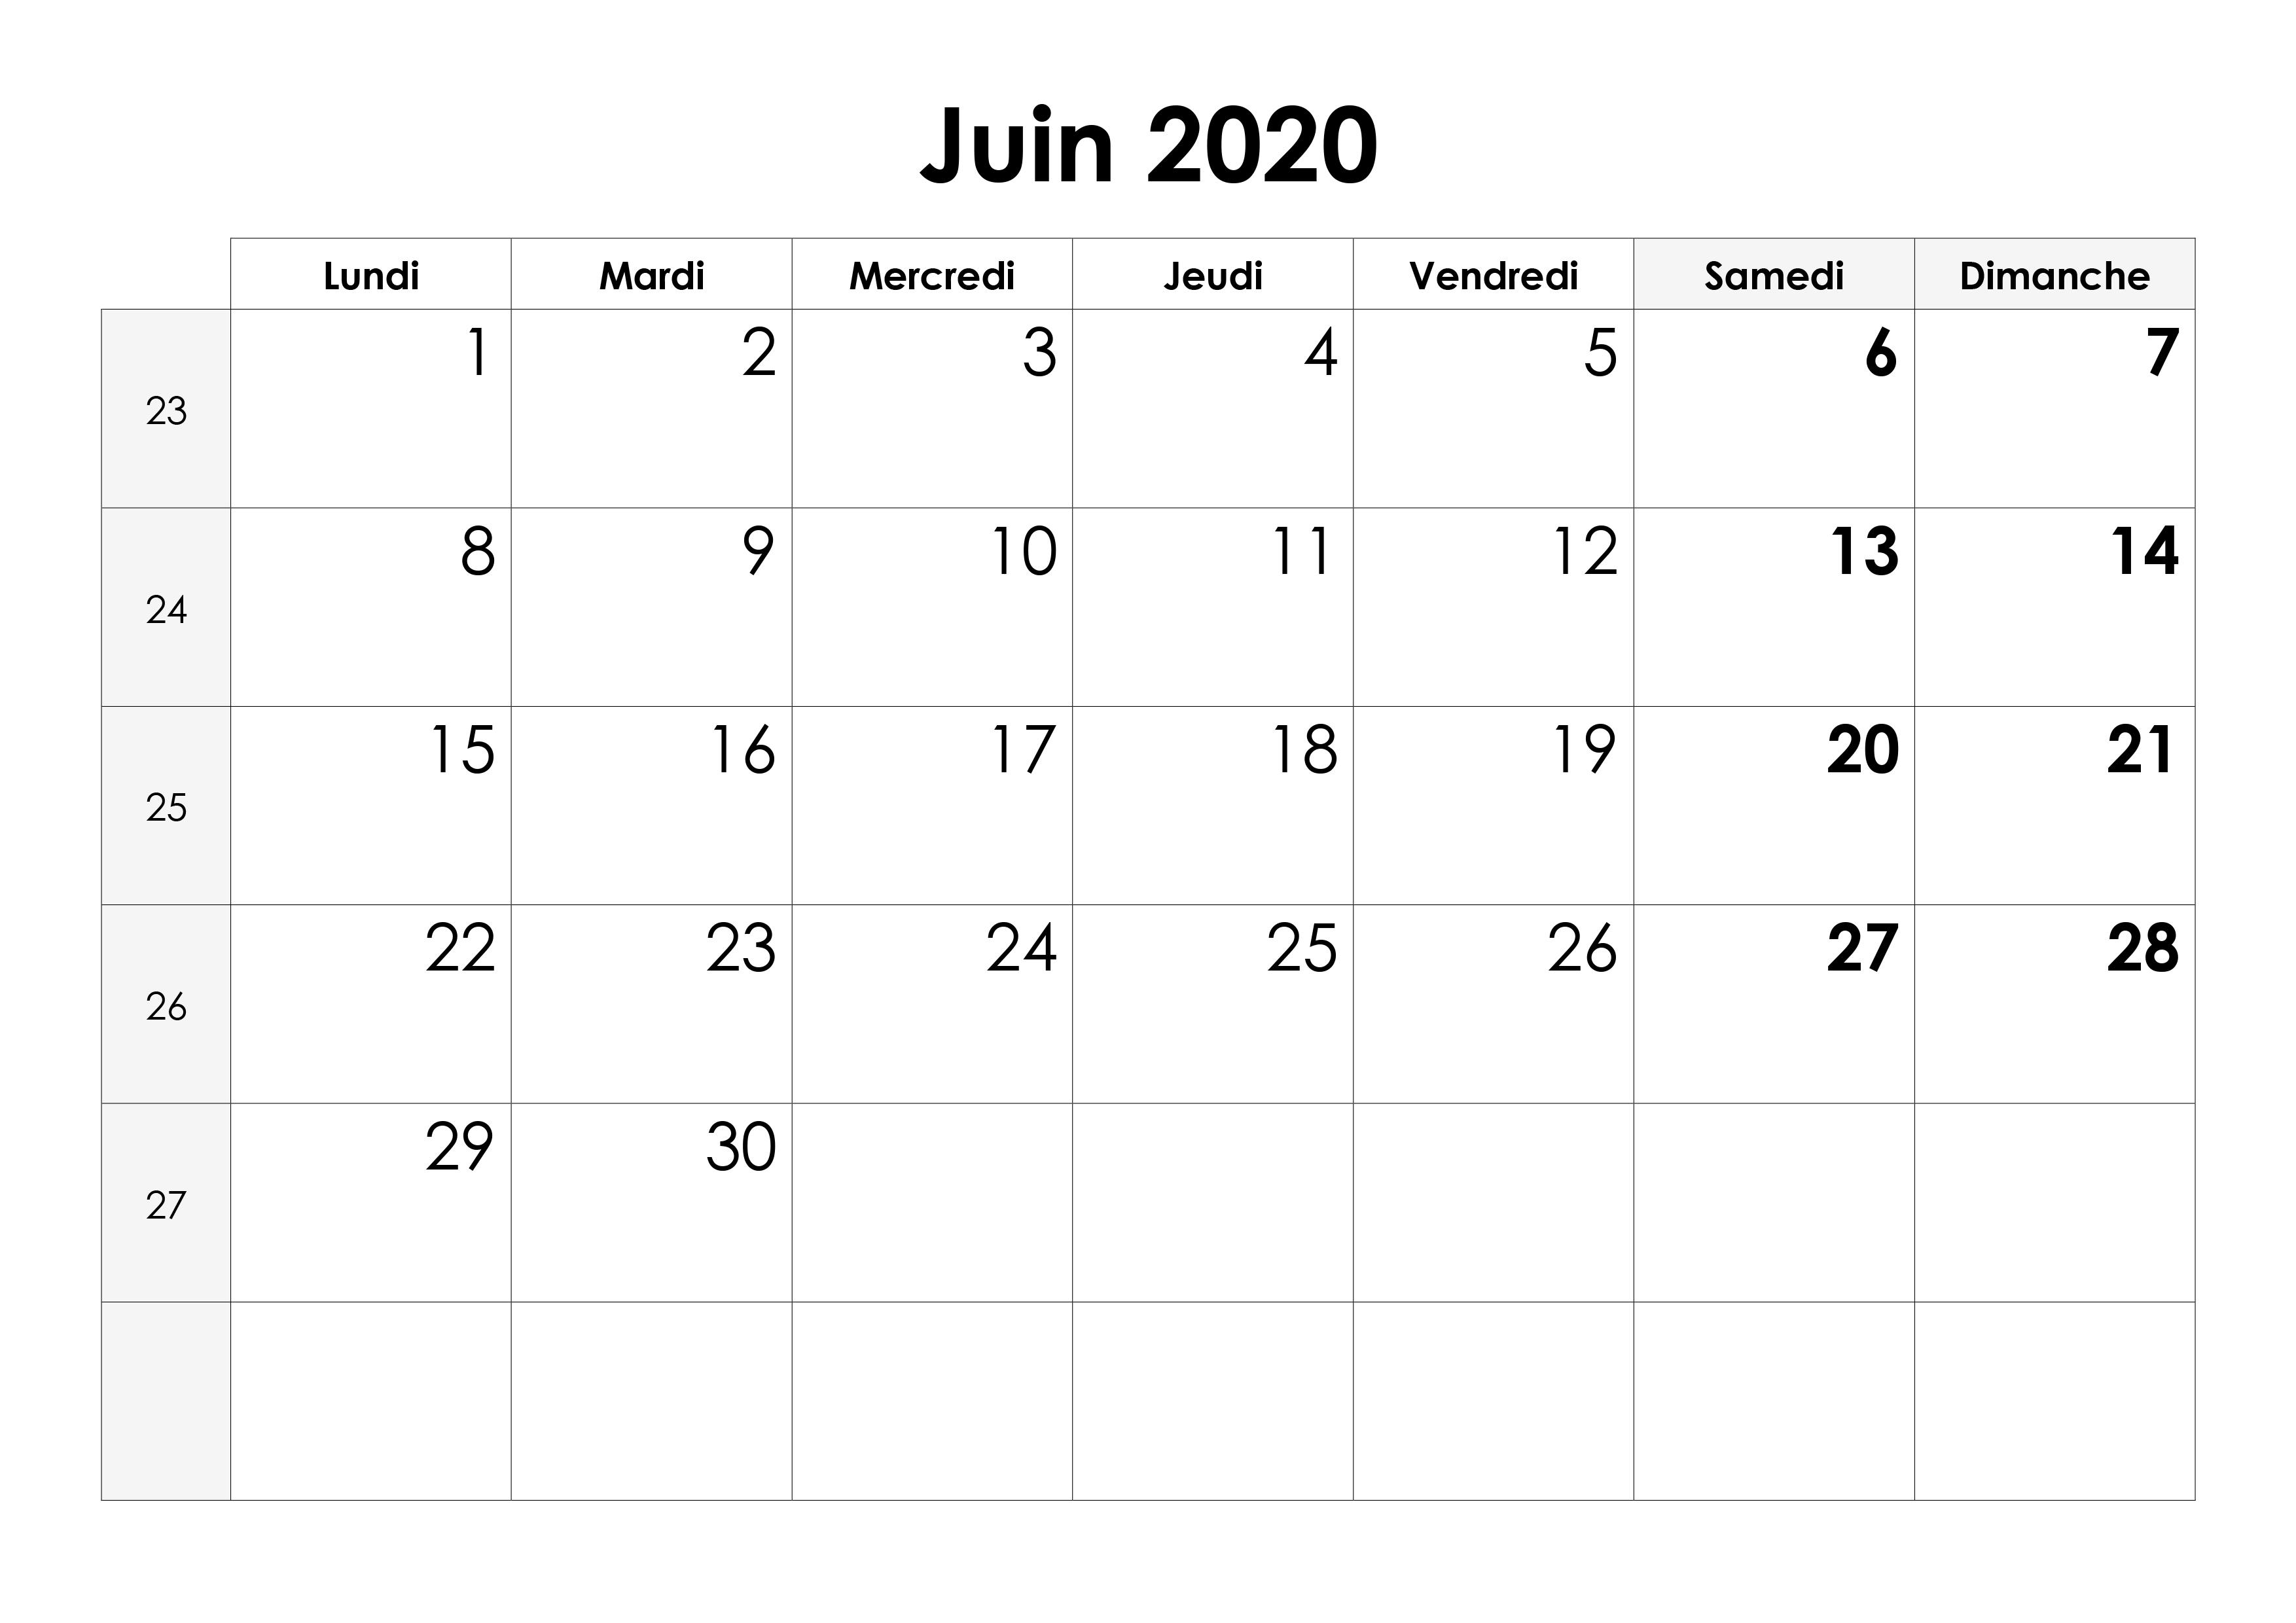 Calendrier Juin 2020.Calendrier Juin 2020 Calendrier Su